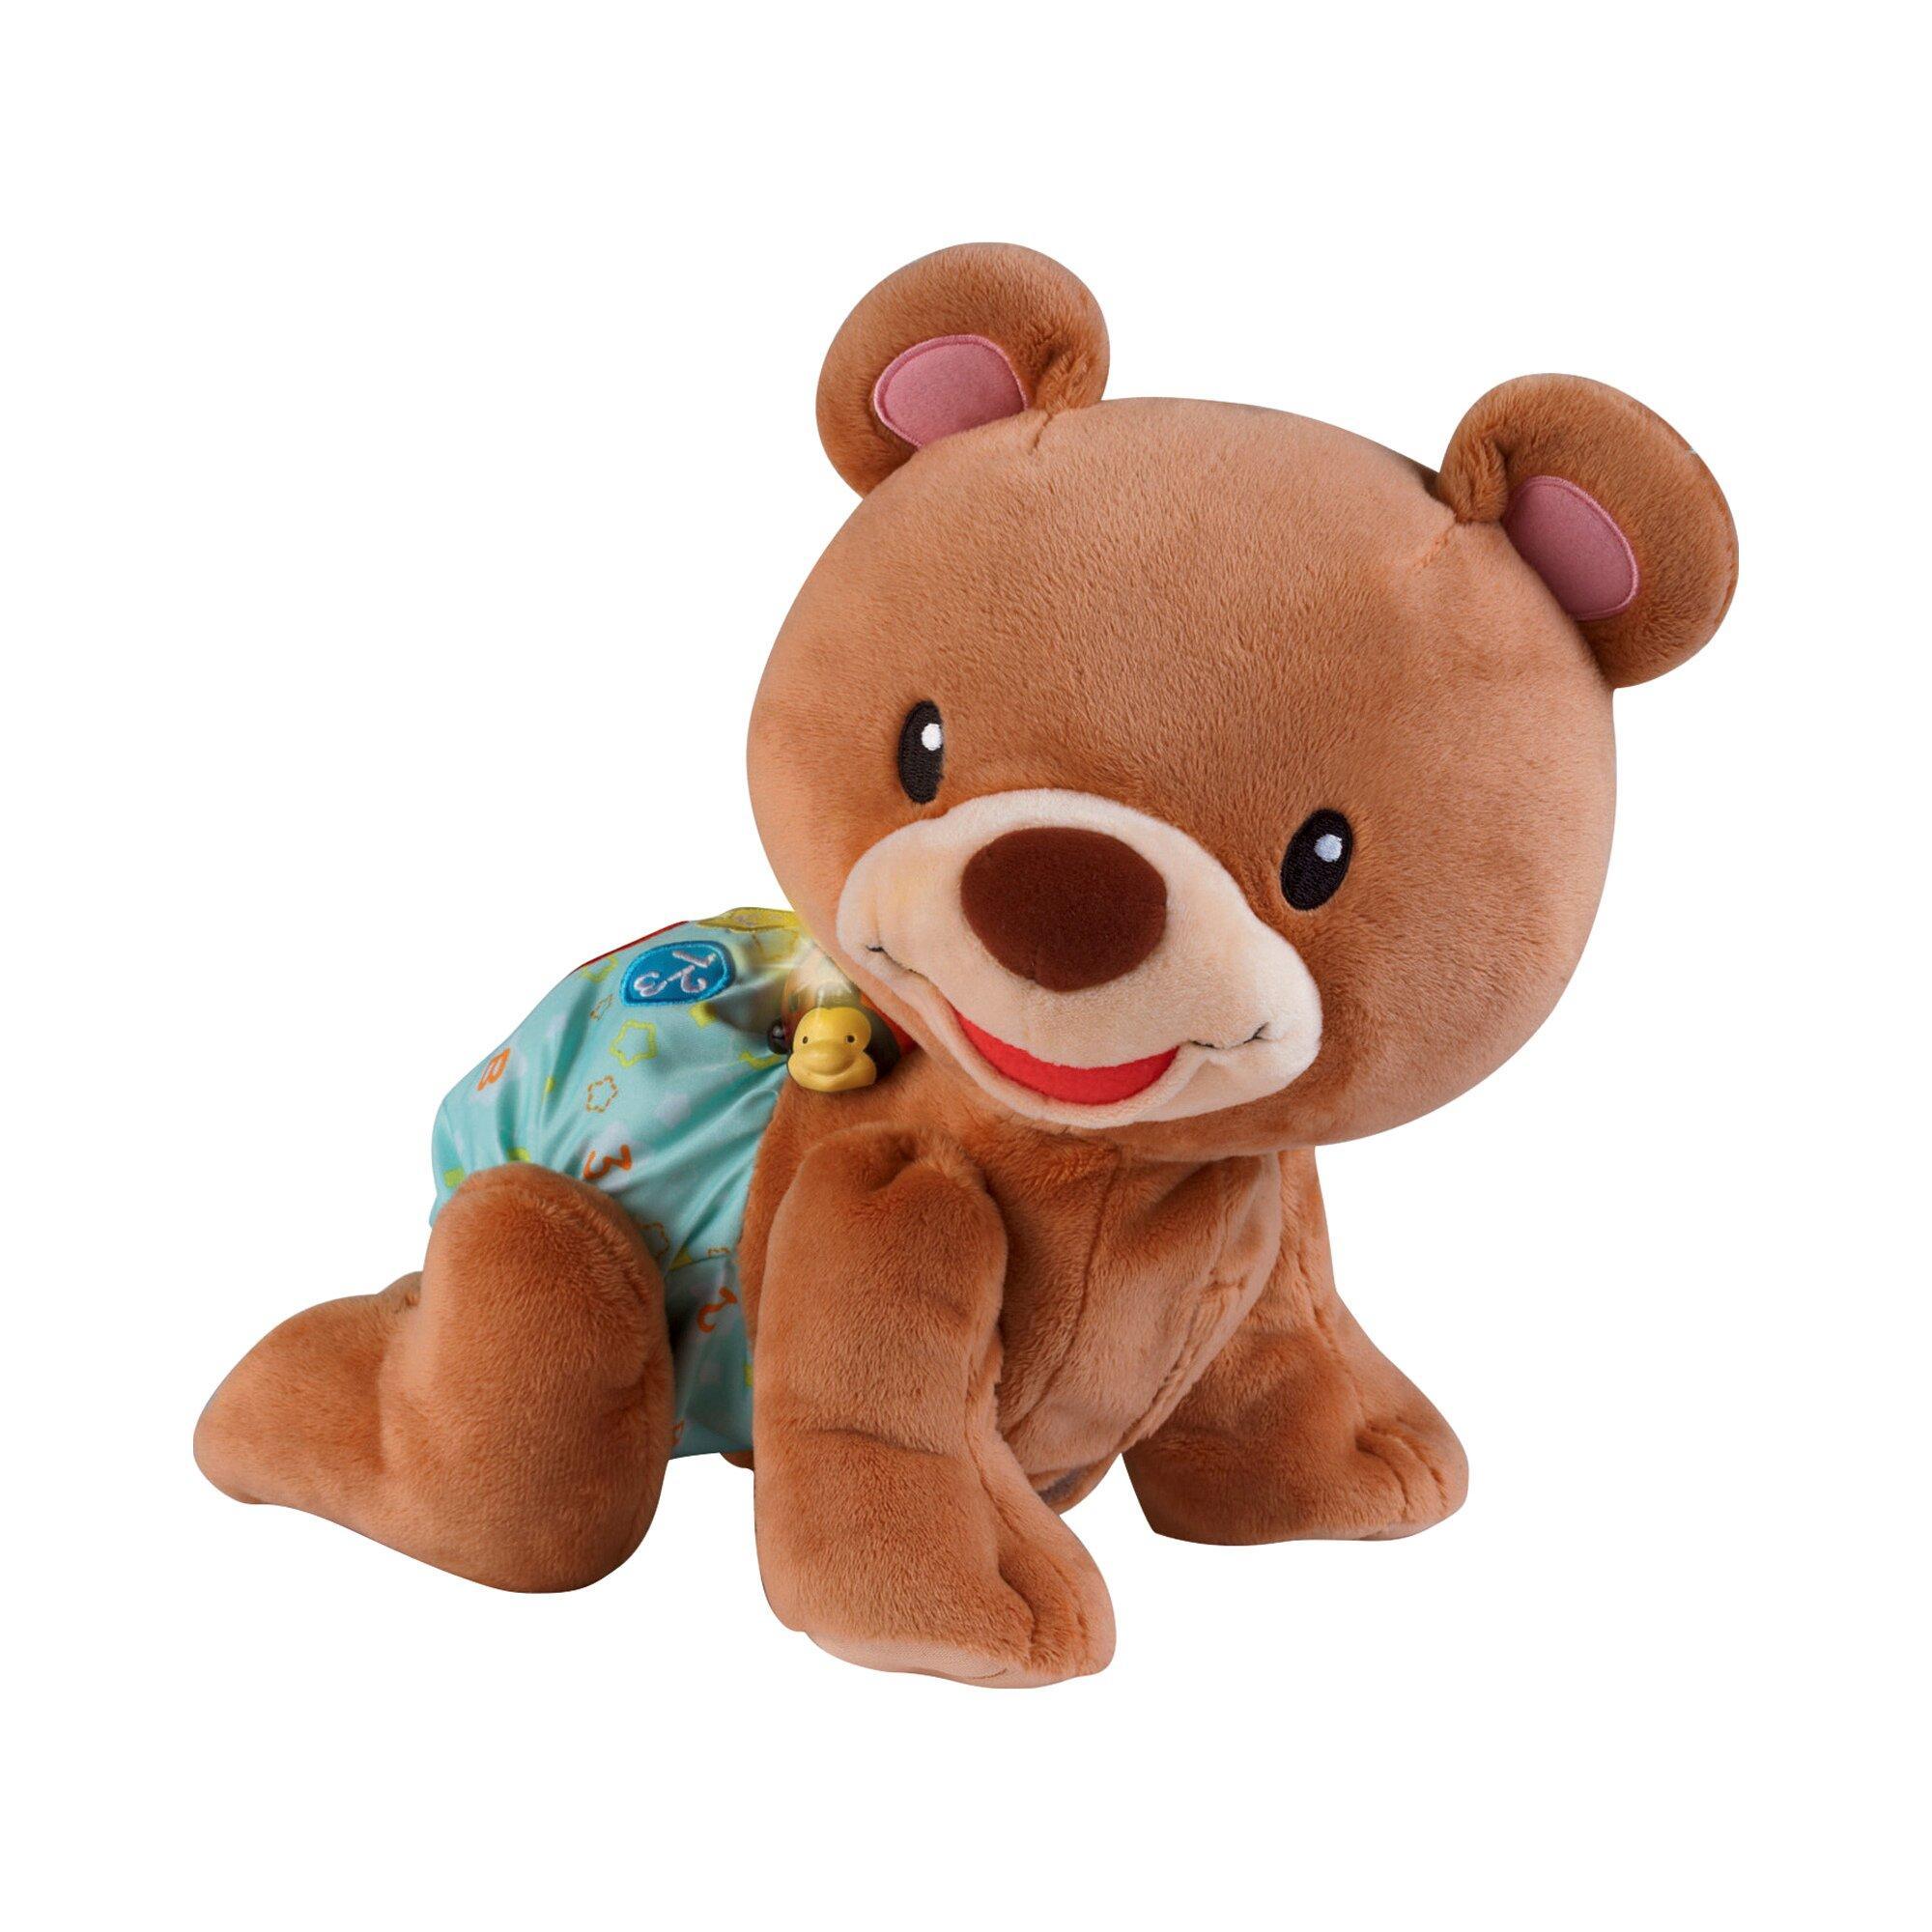 Stoffspielzeug Krabbel mit mir Bär